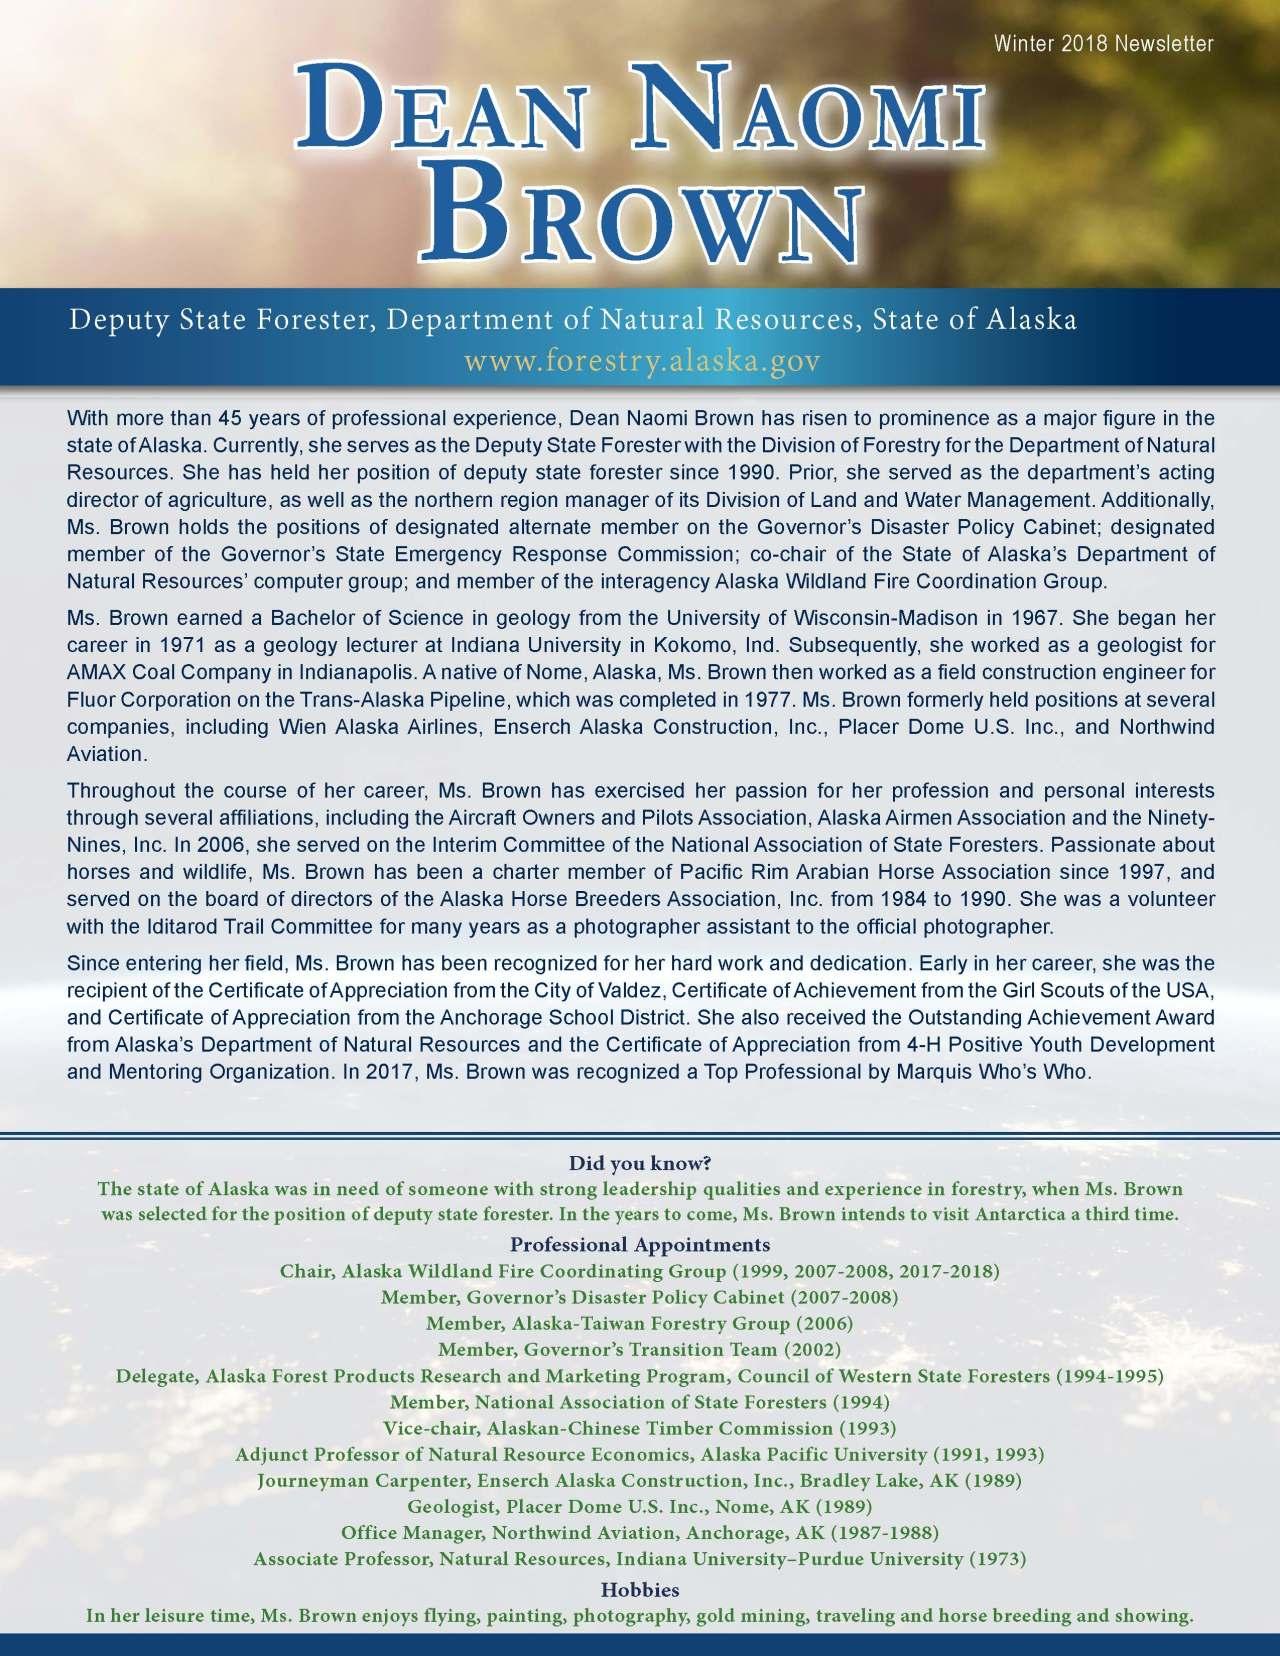 Brown, Dean 2133381_20057345 Newsletter REVISED.jpg